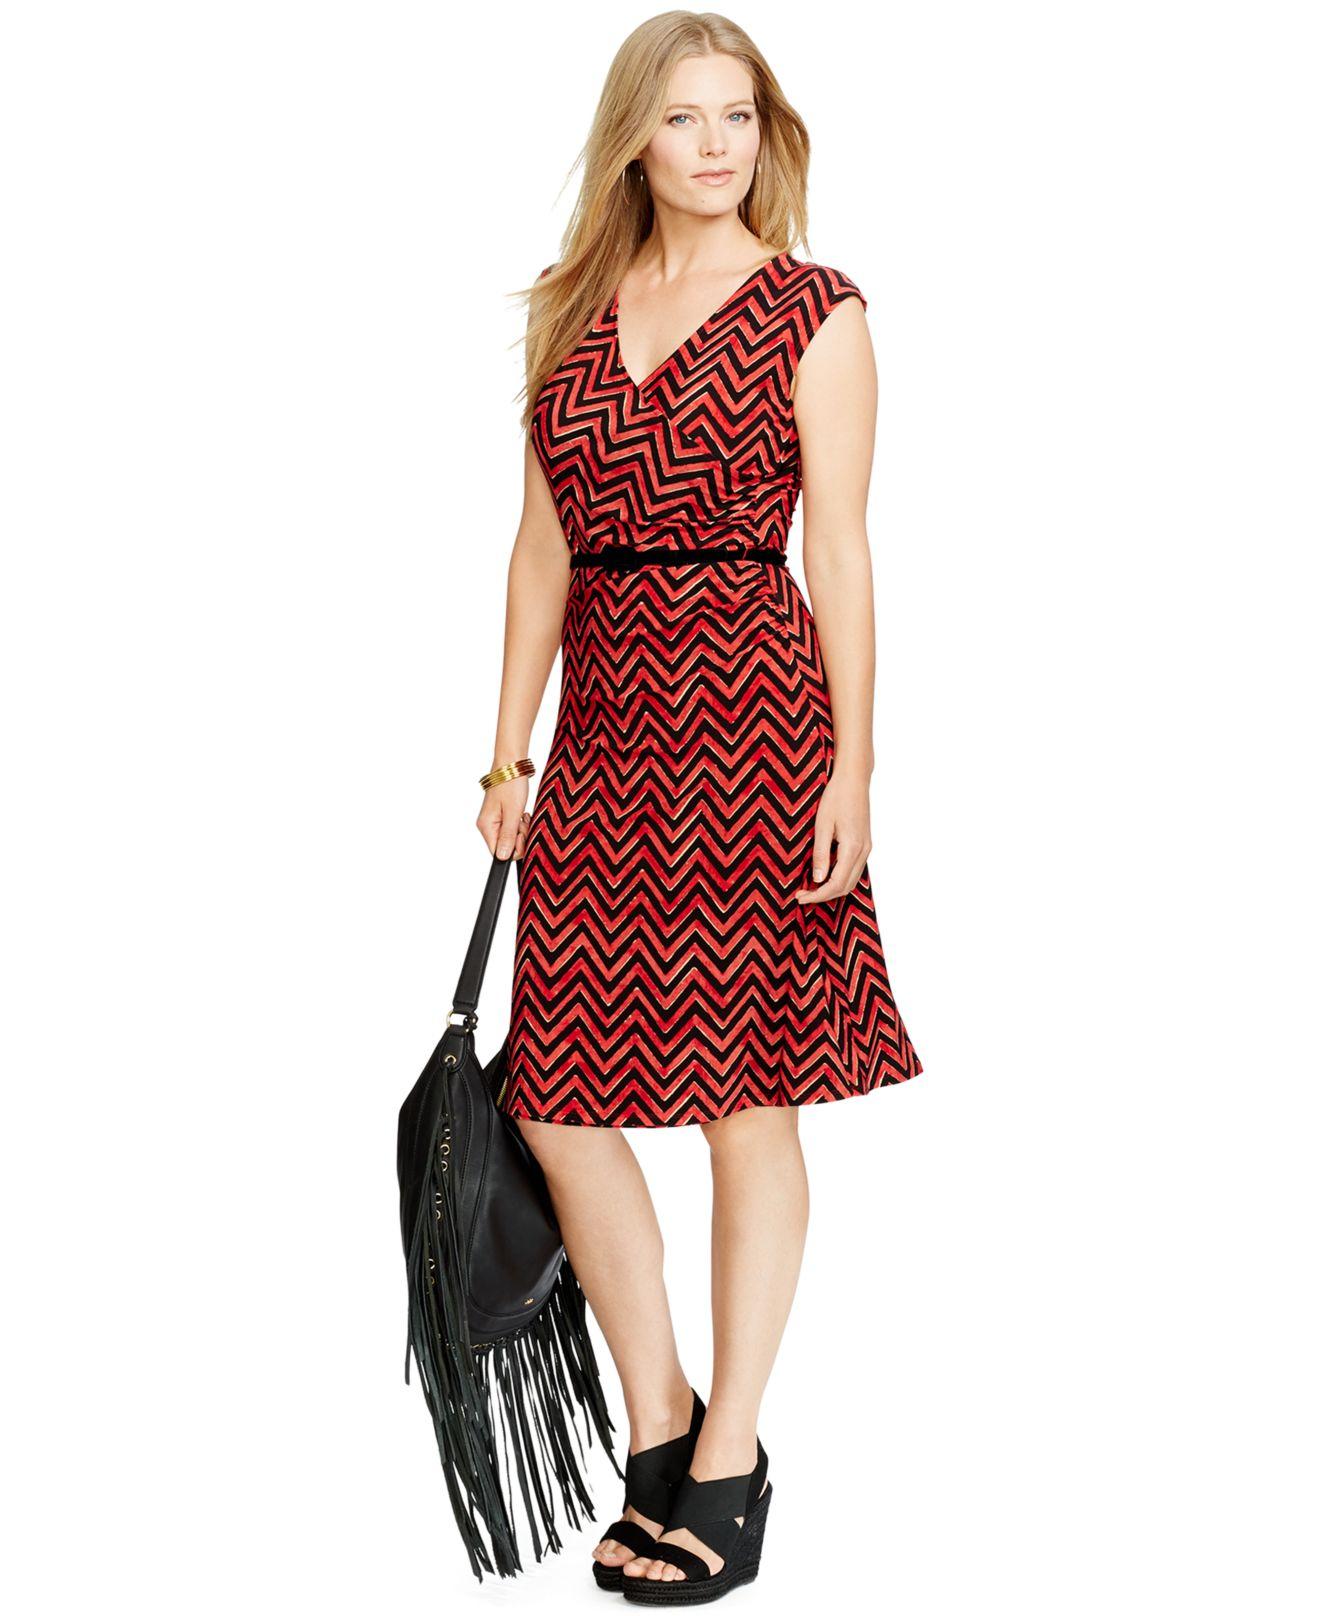 Lyst Lauren By Ralph Lauren Plus Size Belted Chevron Dress